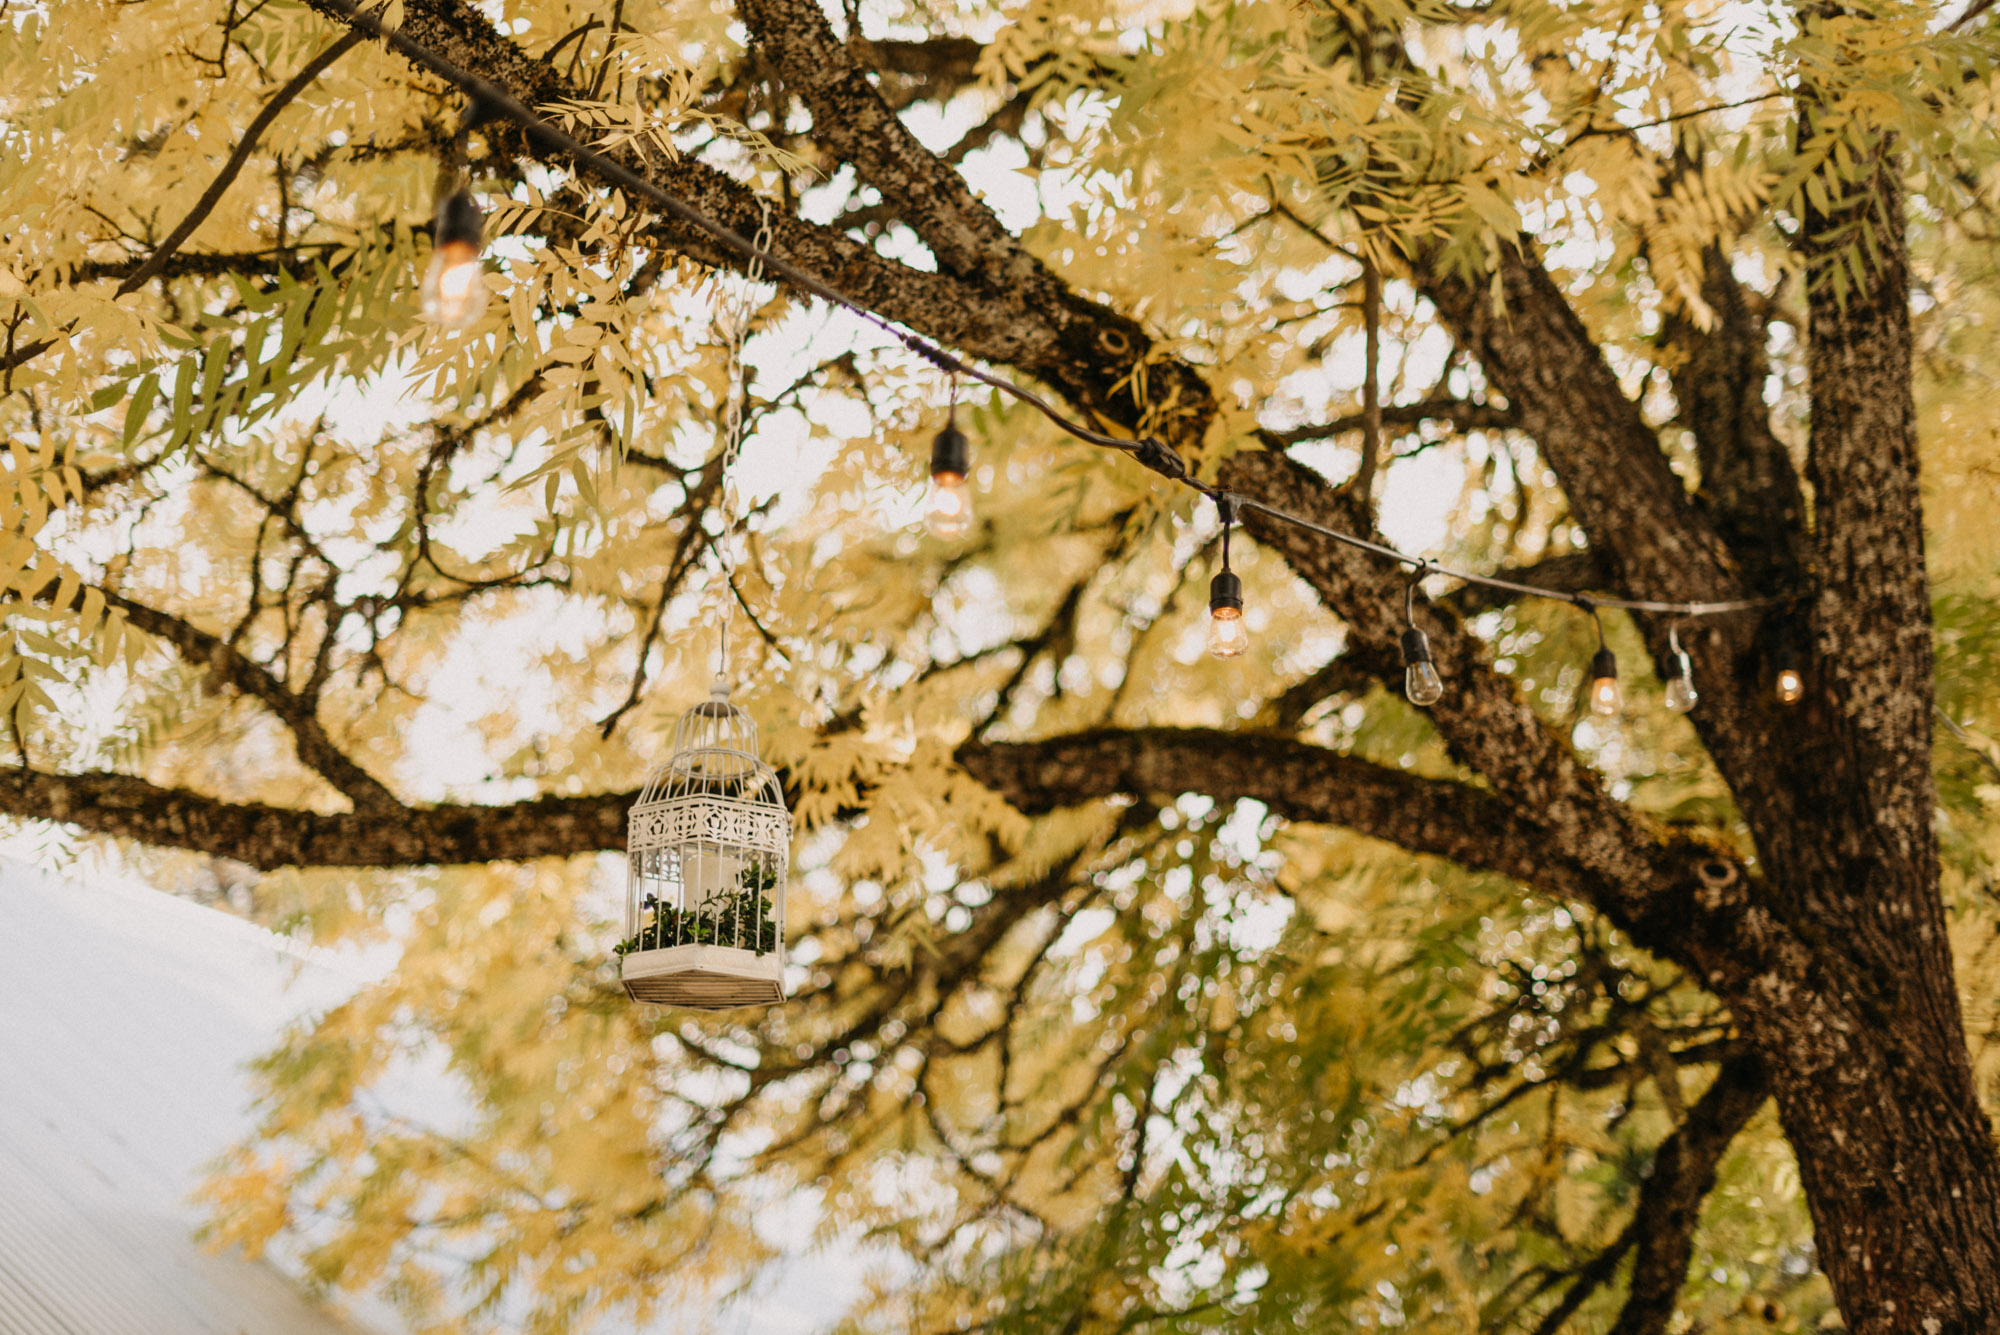 Getting-Ready-Swingset-Washington-Wedding-ringshot-8810.jpg